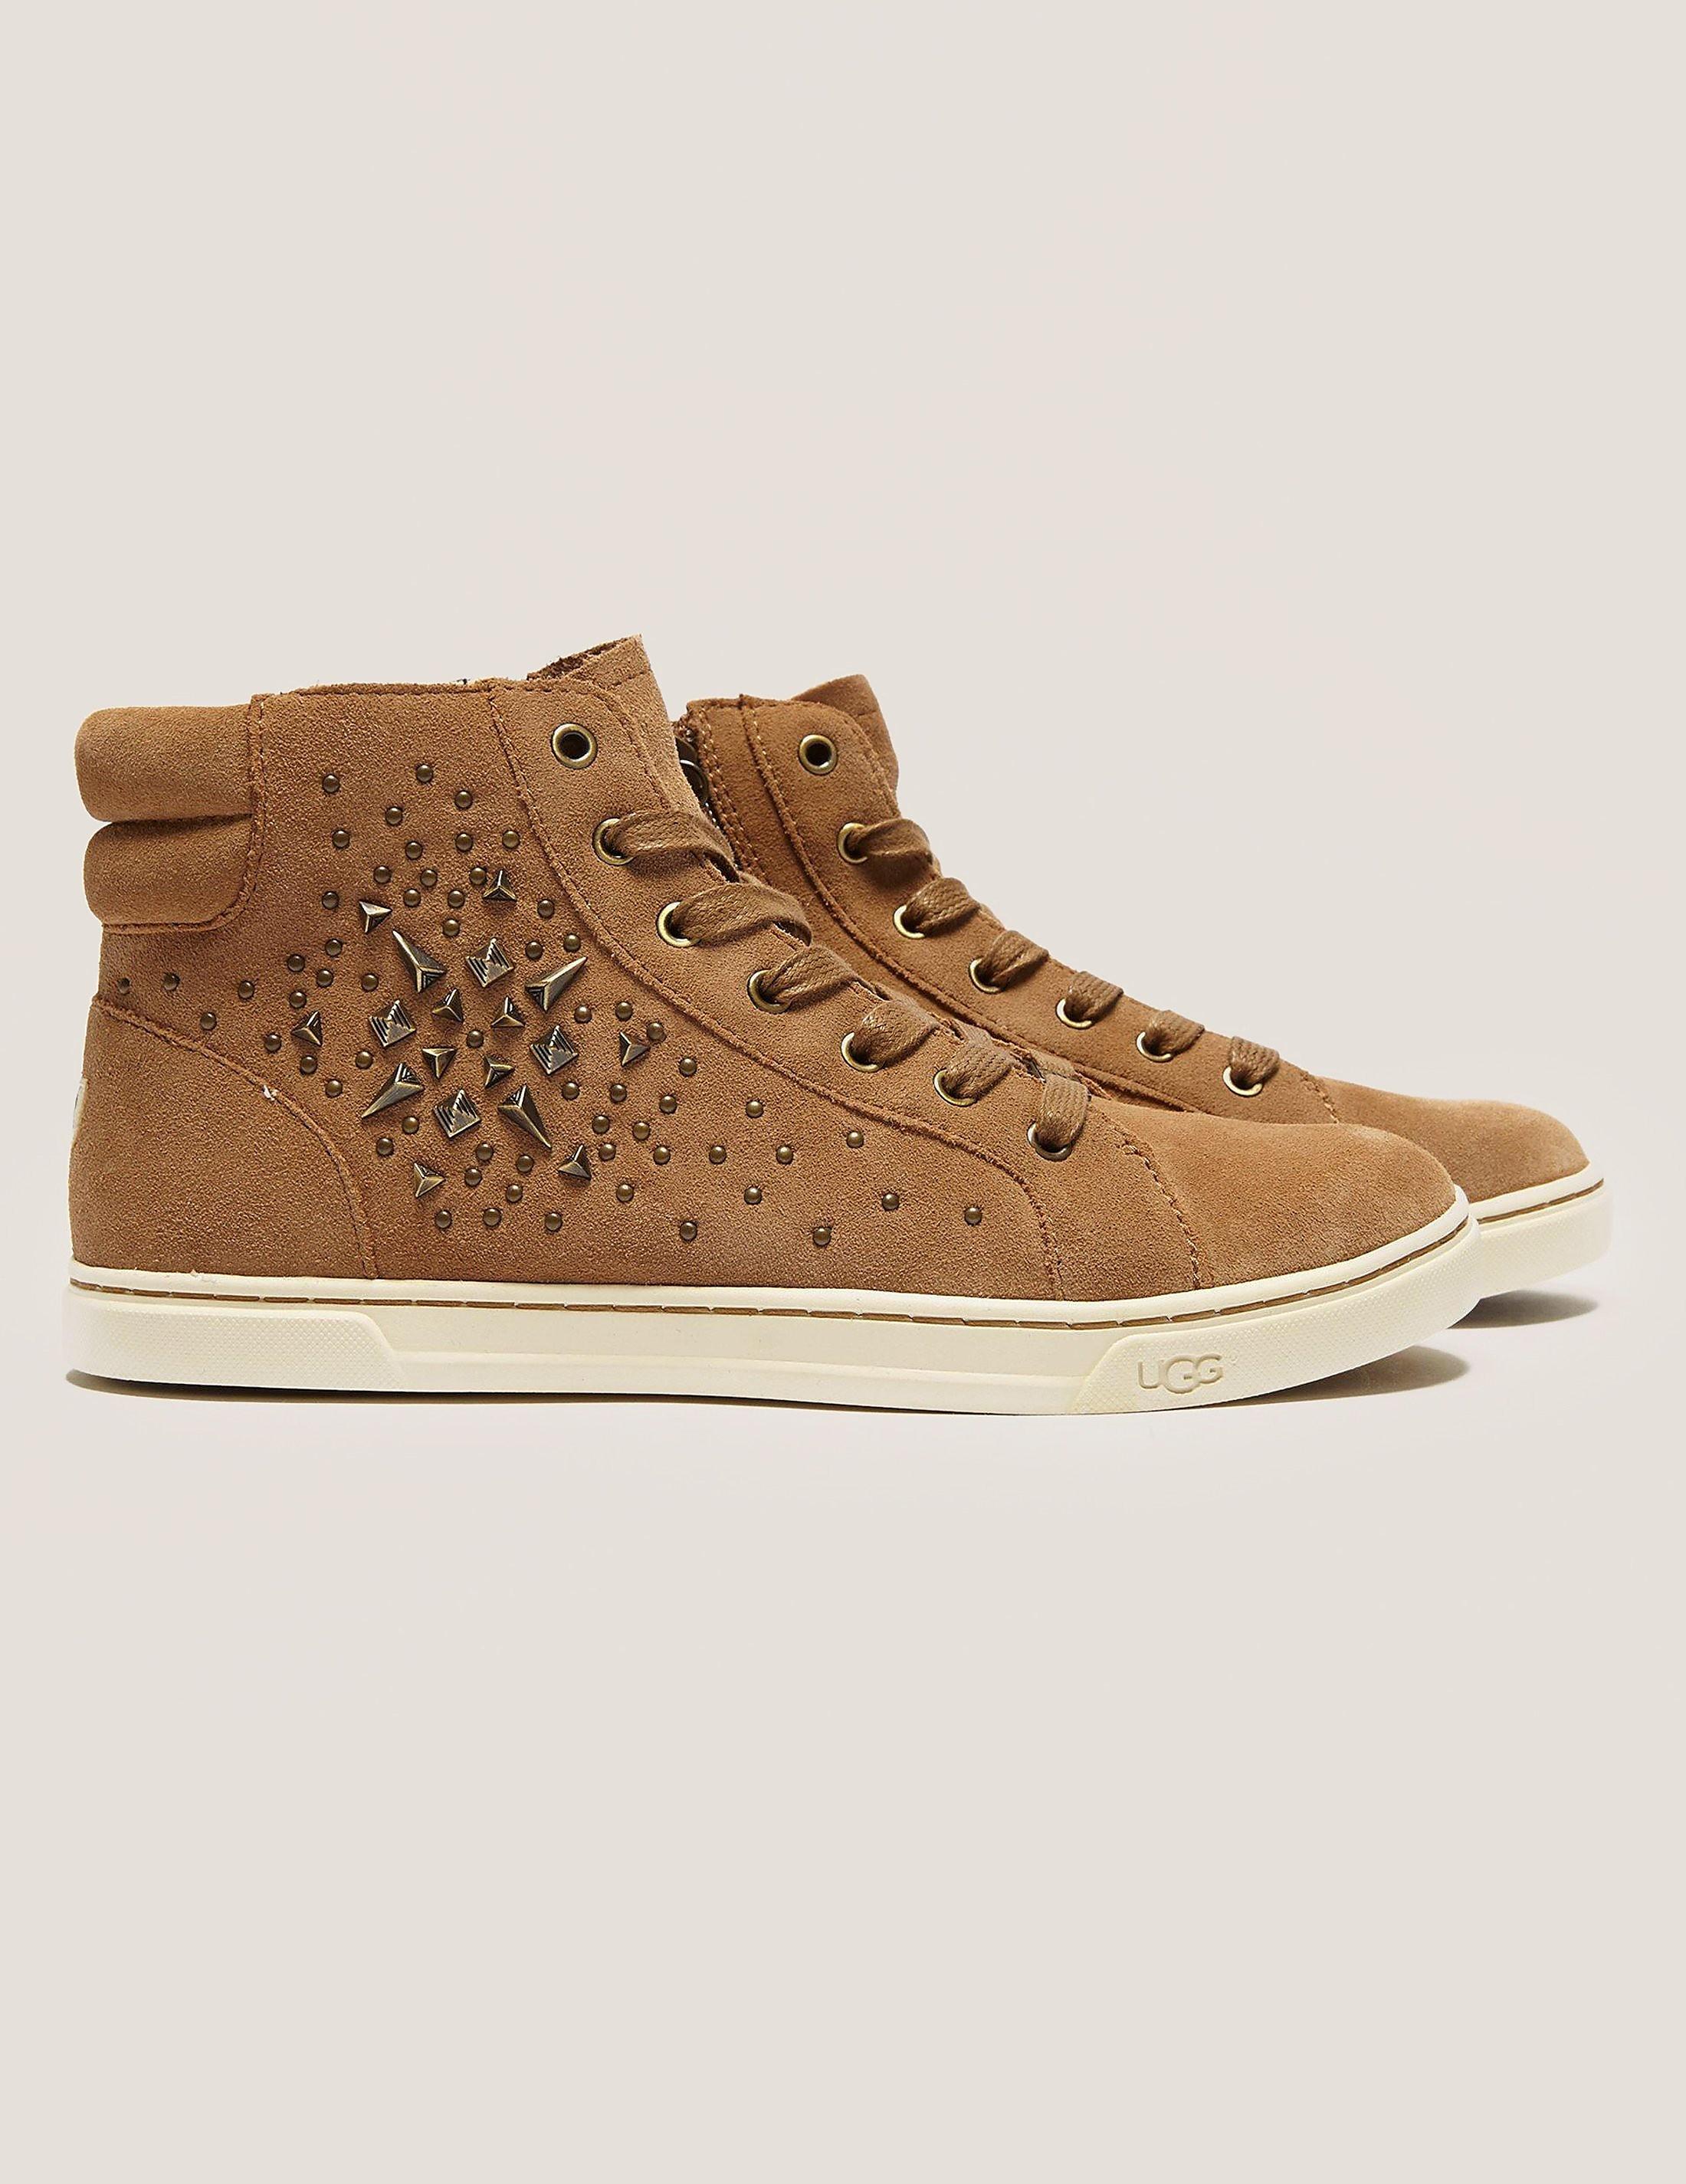 UGG Gradie Boots